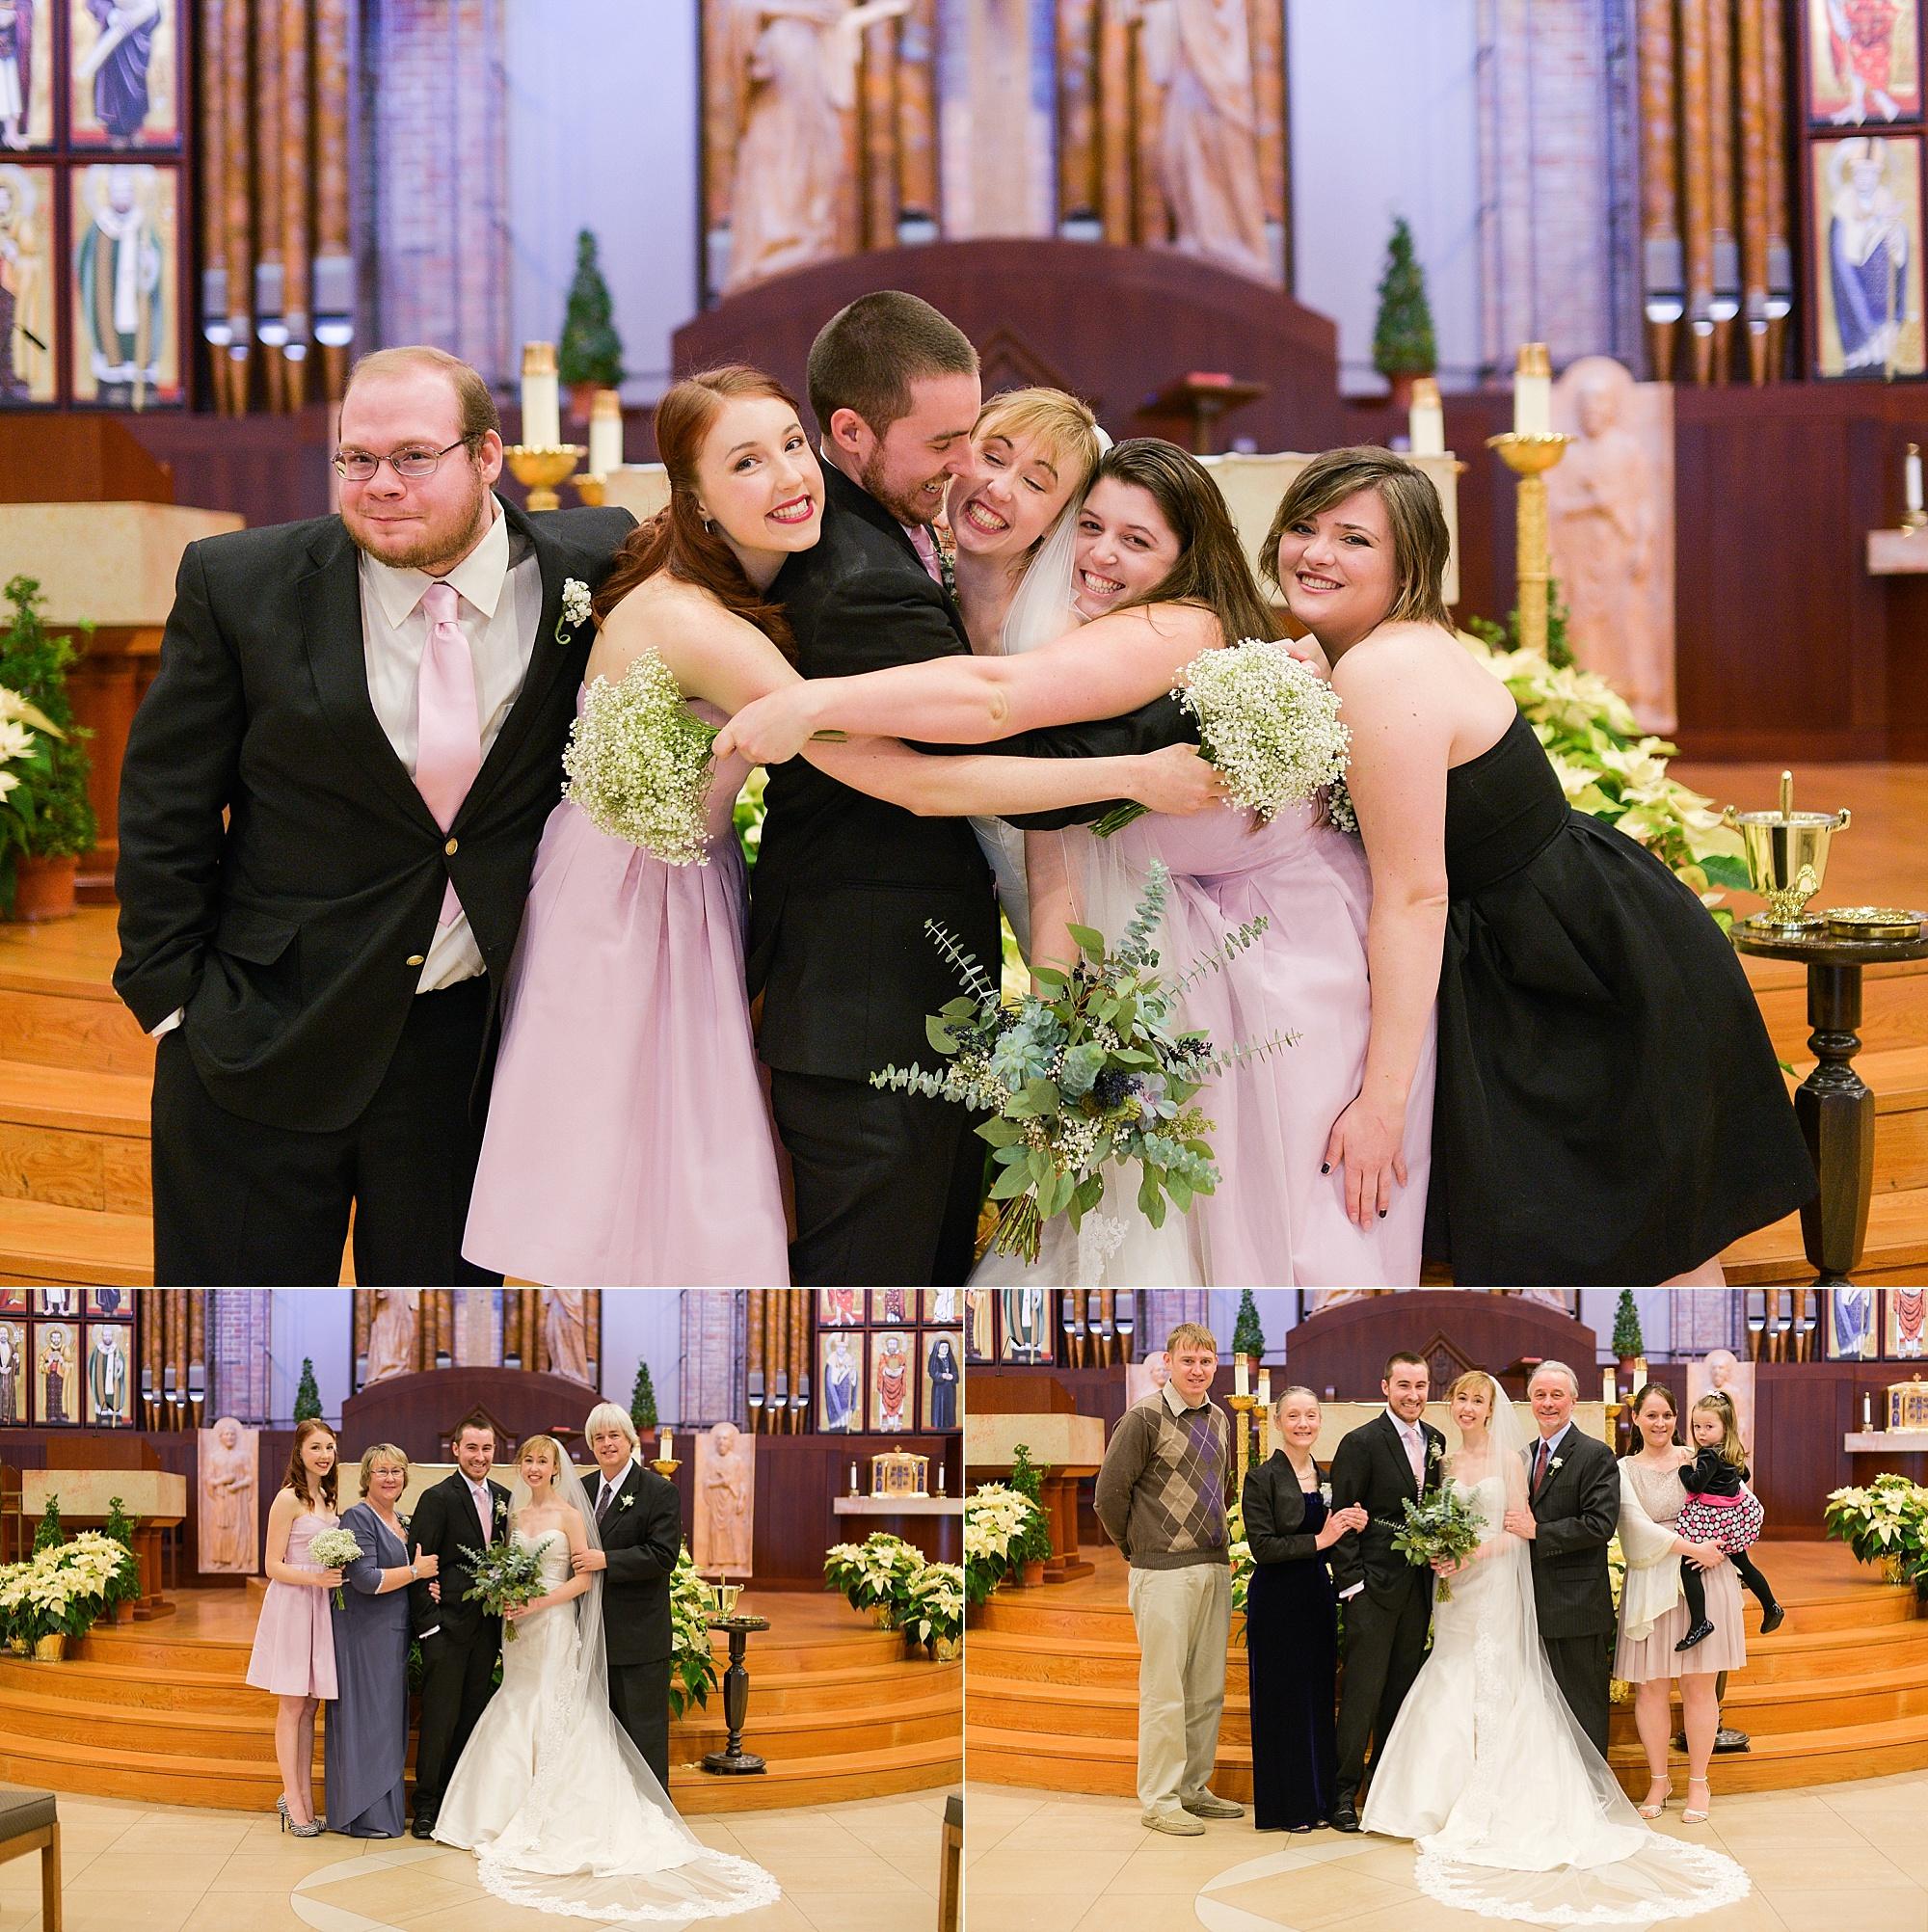 fredericksburg-wedding-church-mercantile_0031.jpg